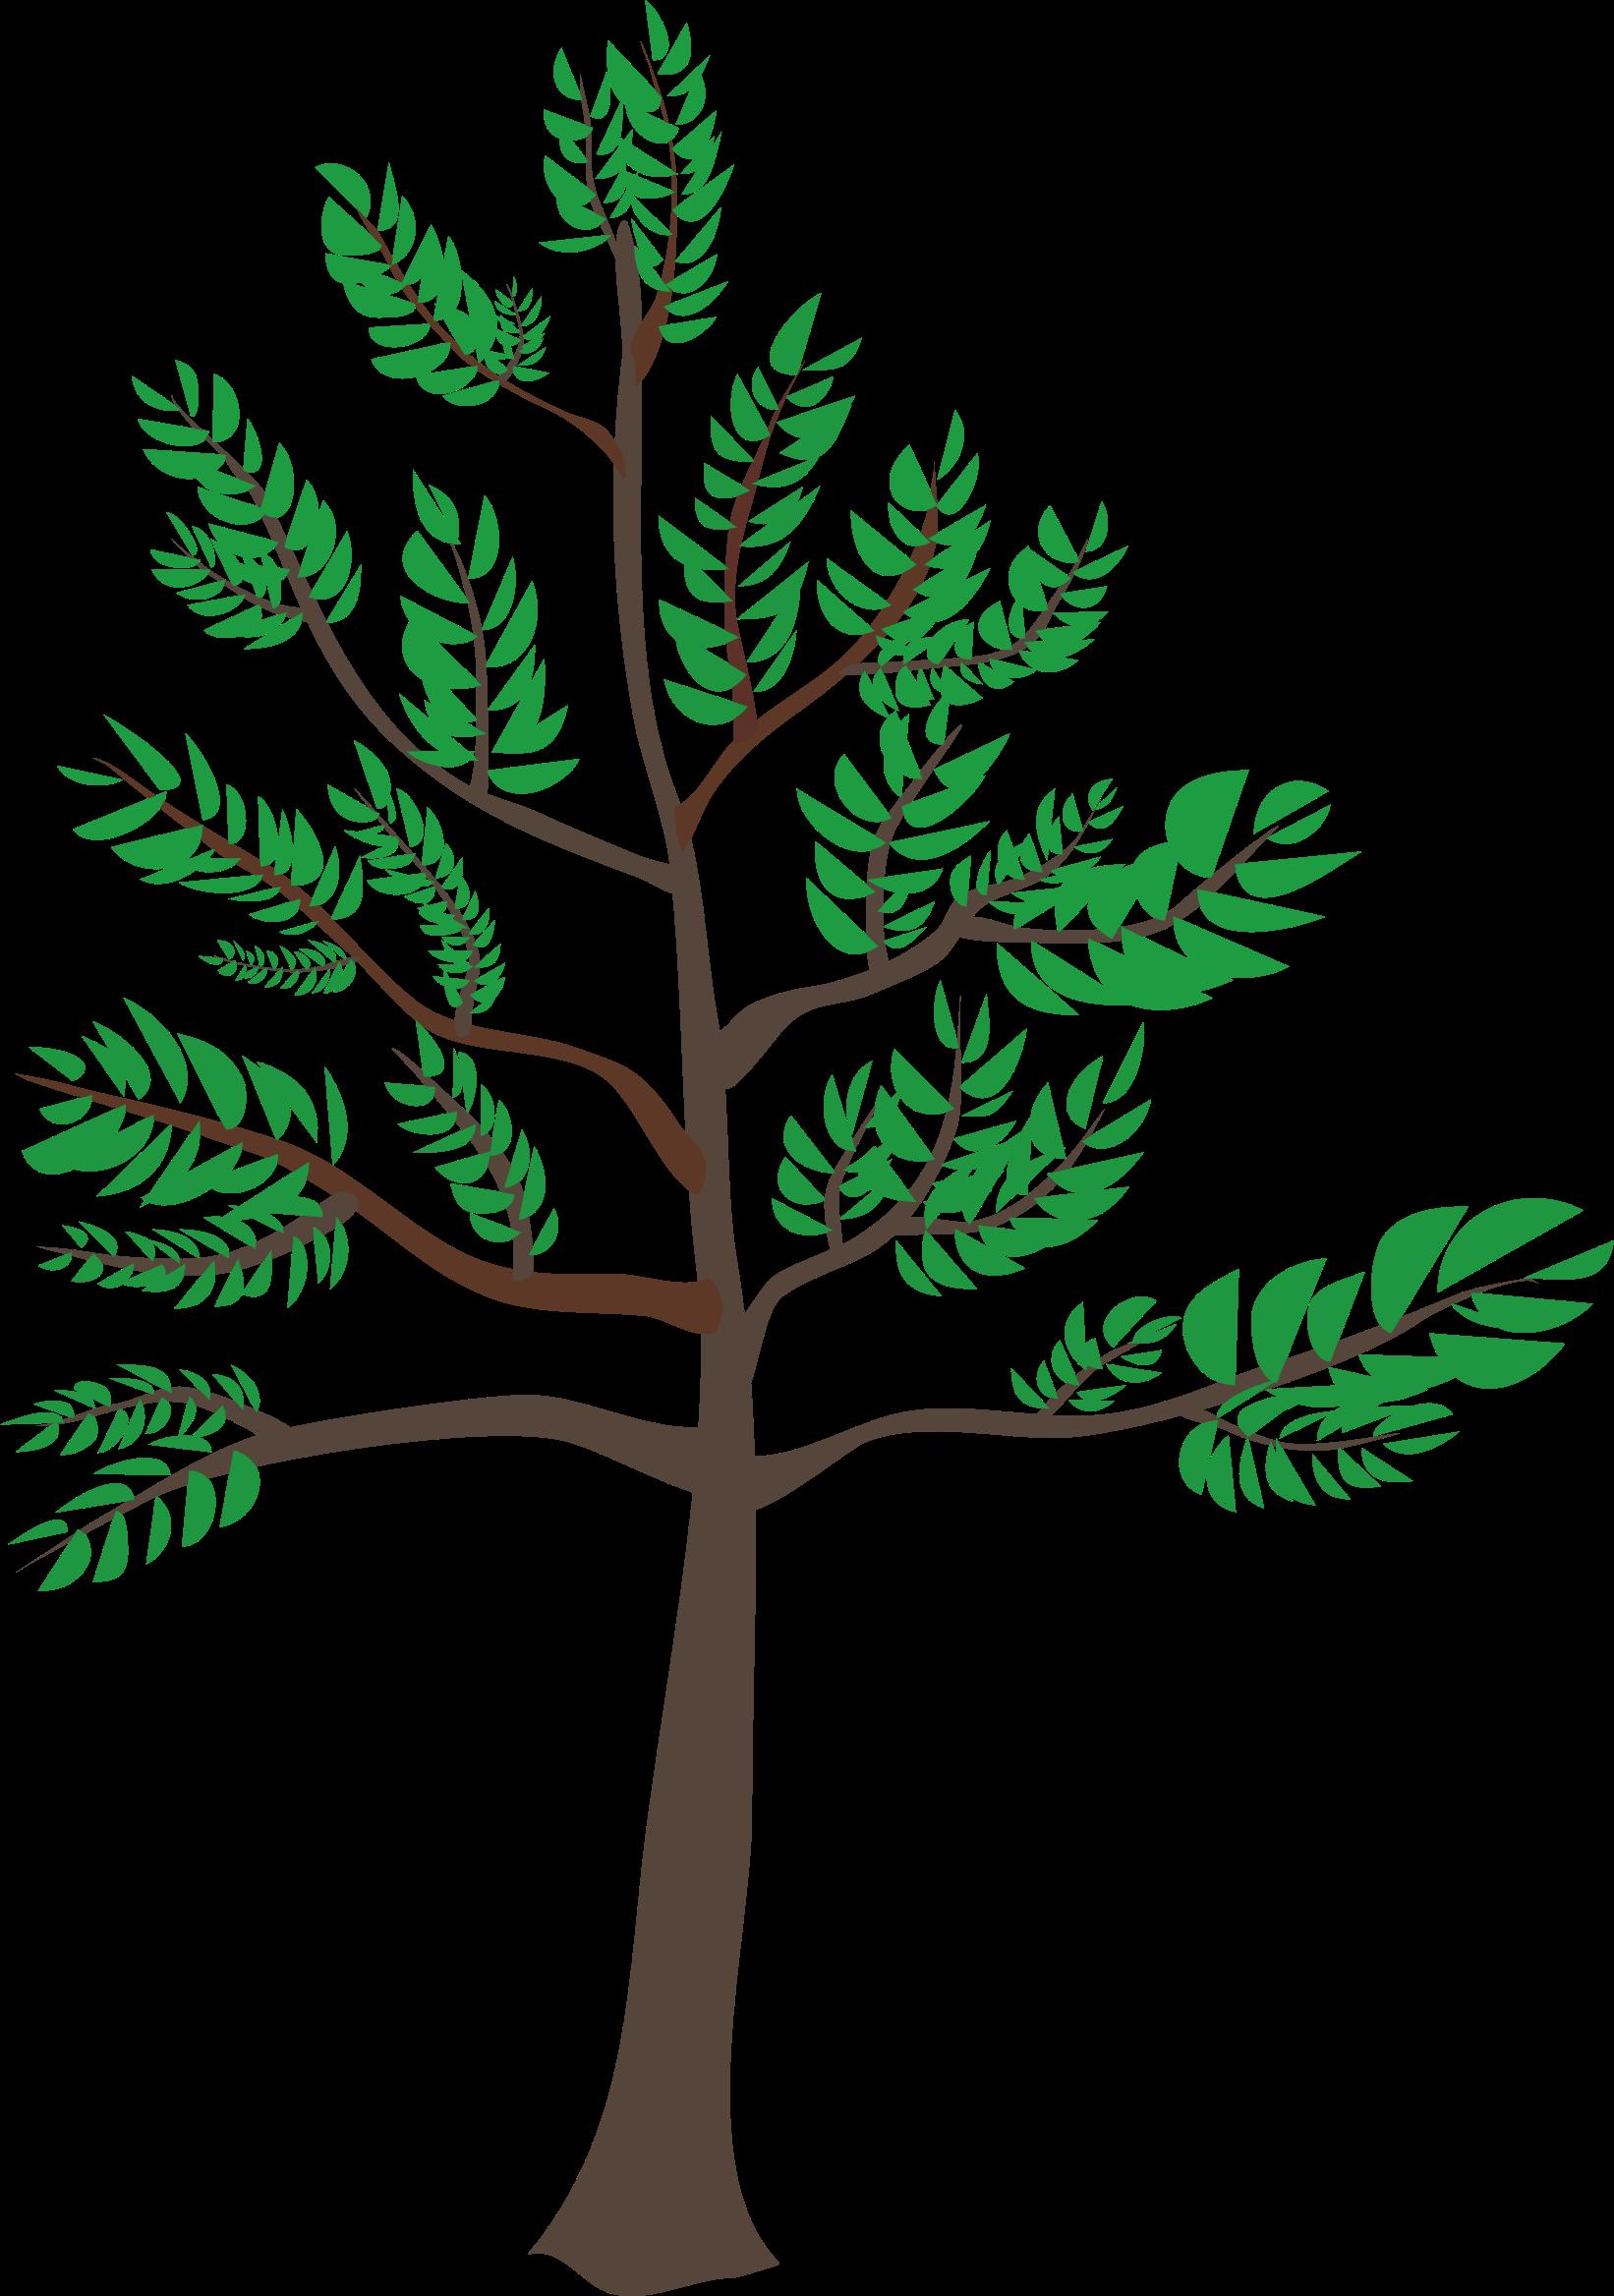 Cedar tree clipart svg library stock 28+ Collection of Young Tree Clipart | High quality, free cliparts ... svg library stock